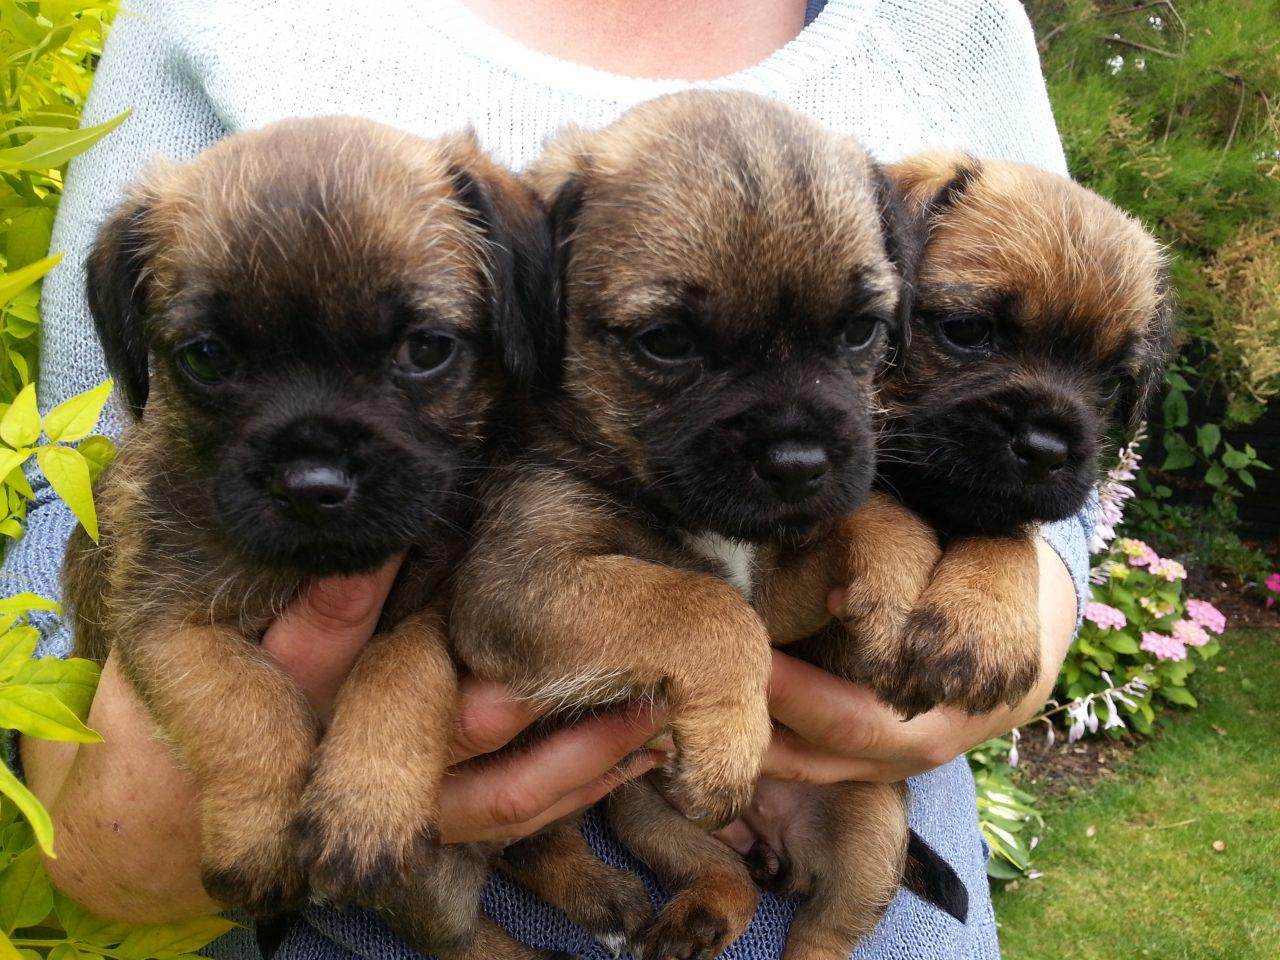 Border Terrrier Puppies, Breed Information, Dog Photos - Doglers | Border Terrier Puppies Western Australia